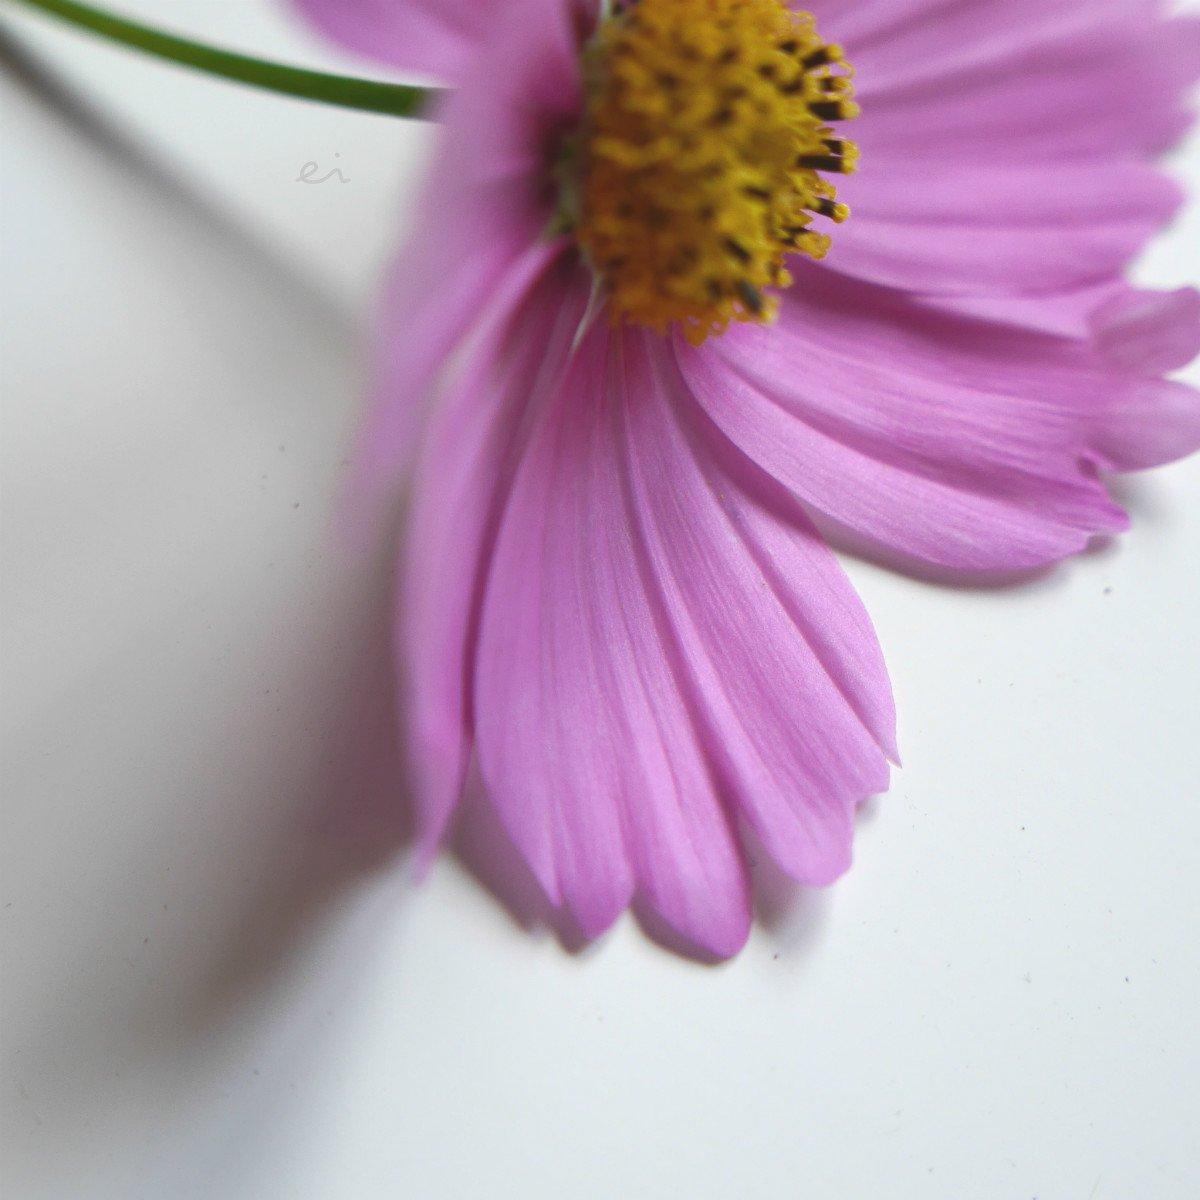 09:39 #photography #flowers #art  #cameralife #lumixG6 #japan #sapporo  IG→ https://t.co/foTcNME73T https://t.co/BJsh2sq8DZ